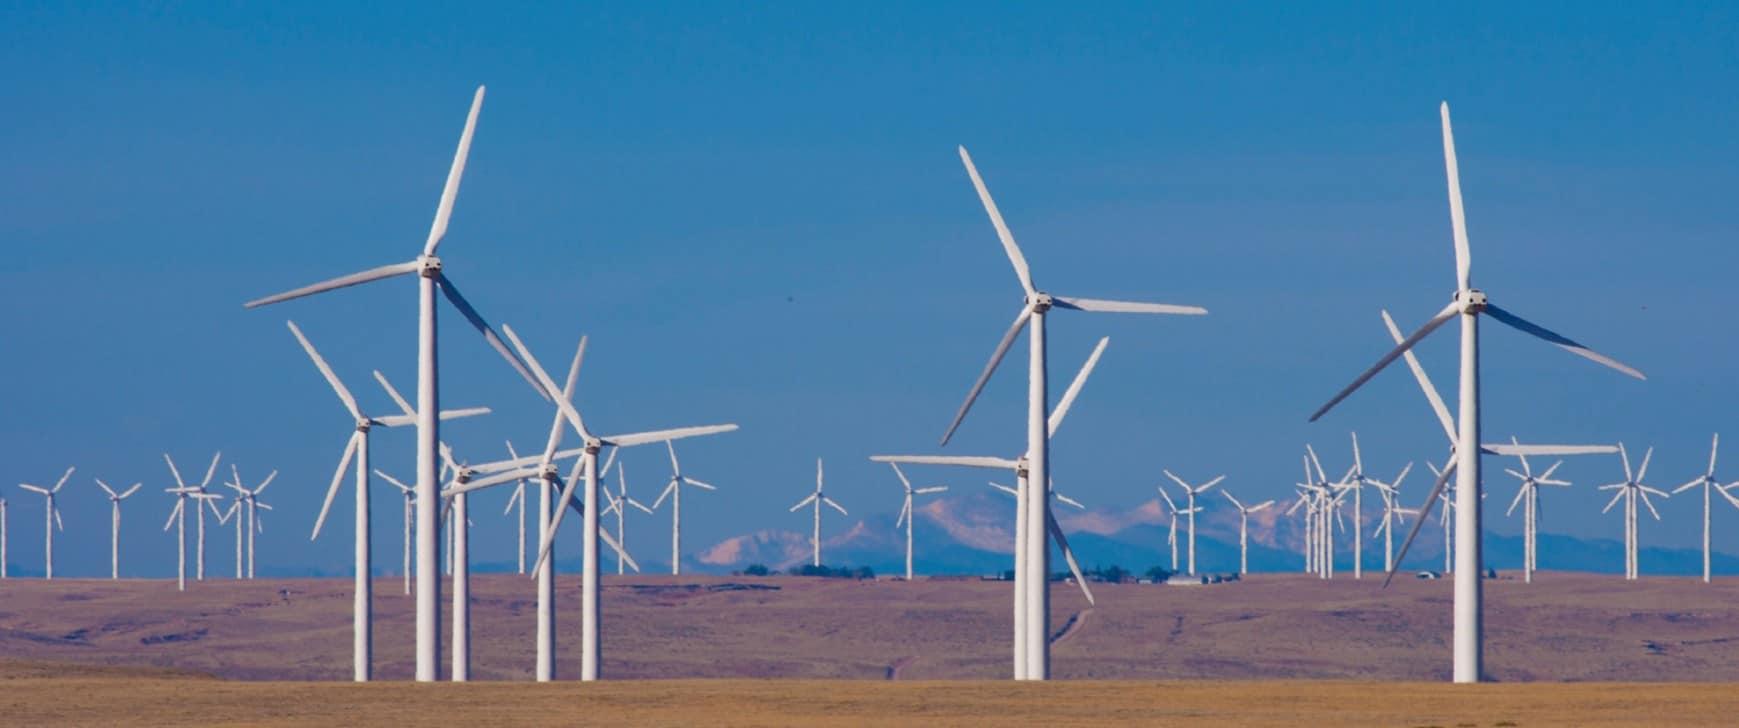 Windpark - Alternative Energie